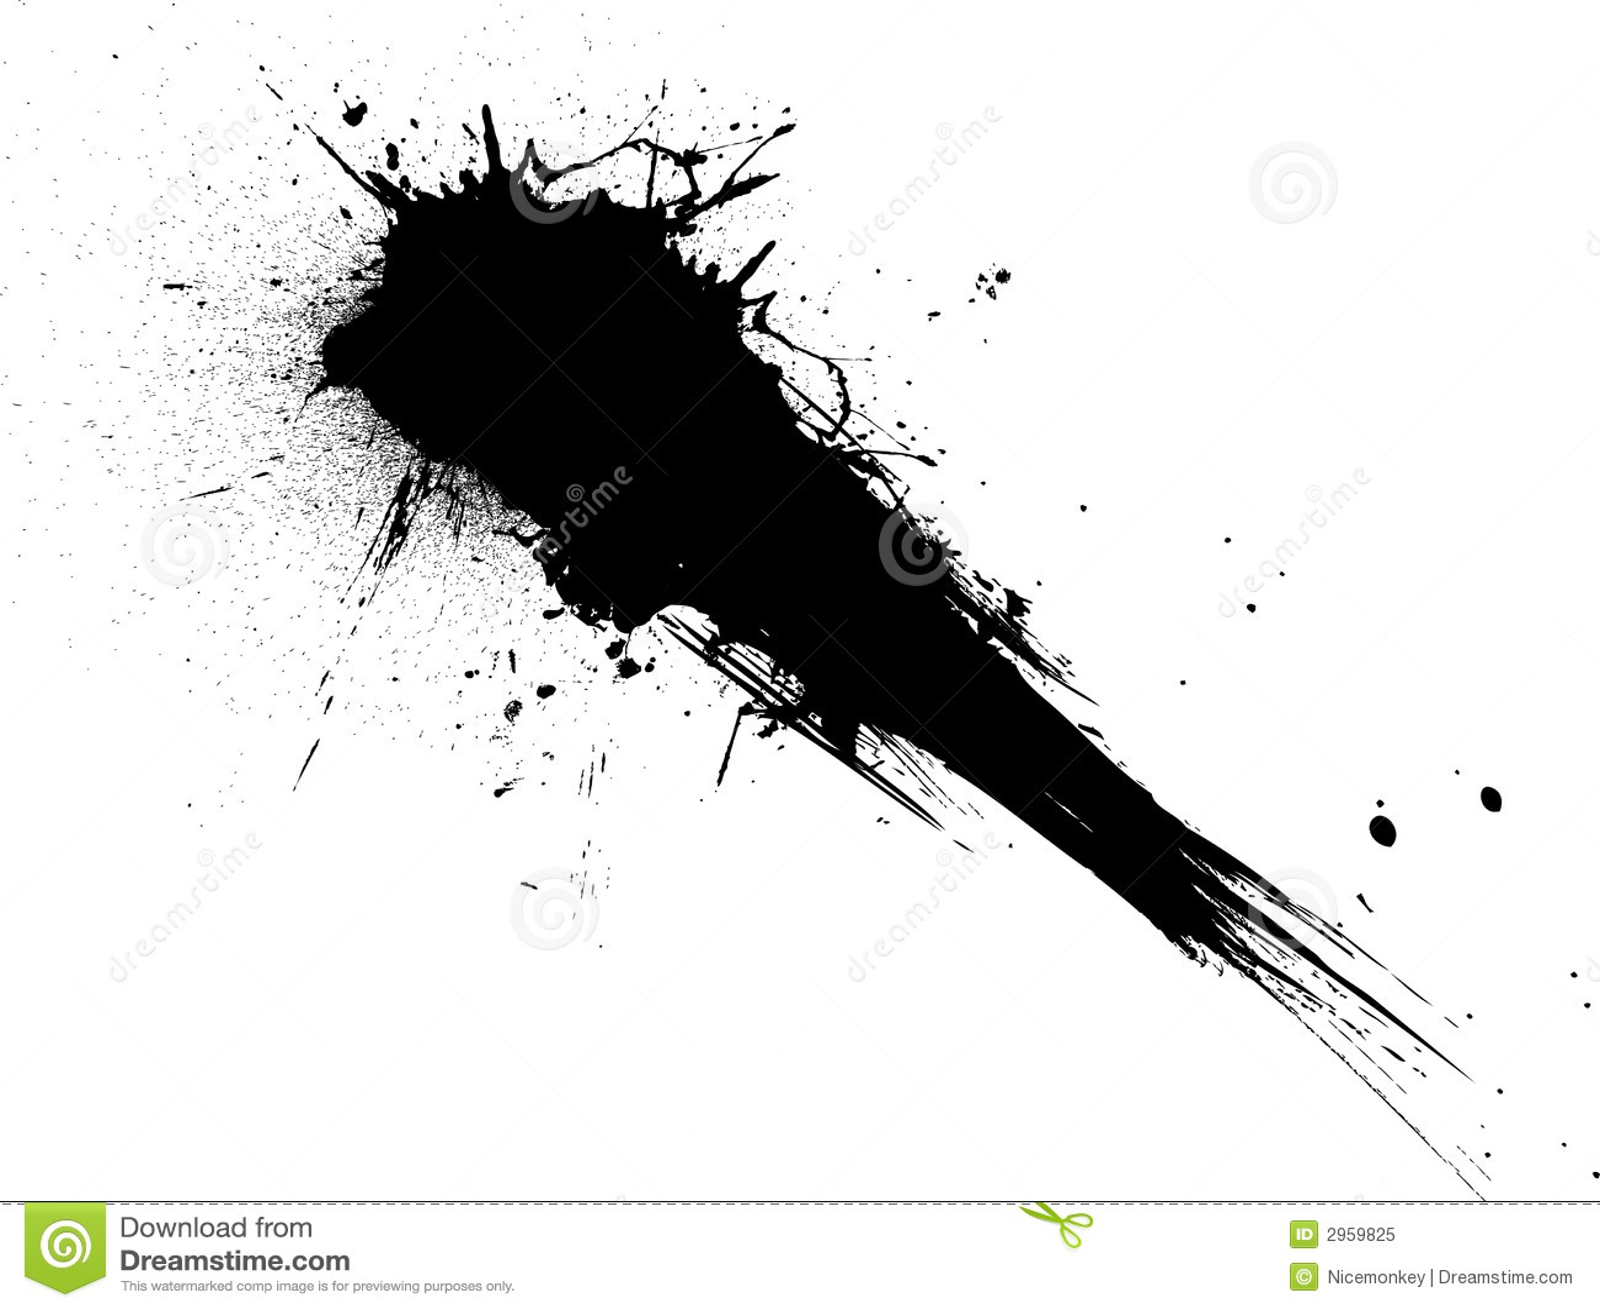 Shooting Splat Stock Vector Illustration Of Silhouette